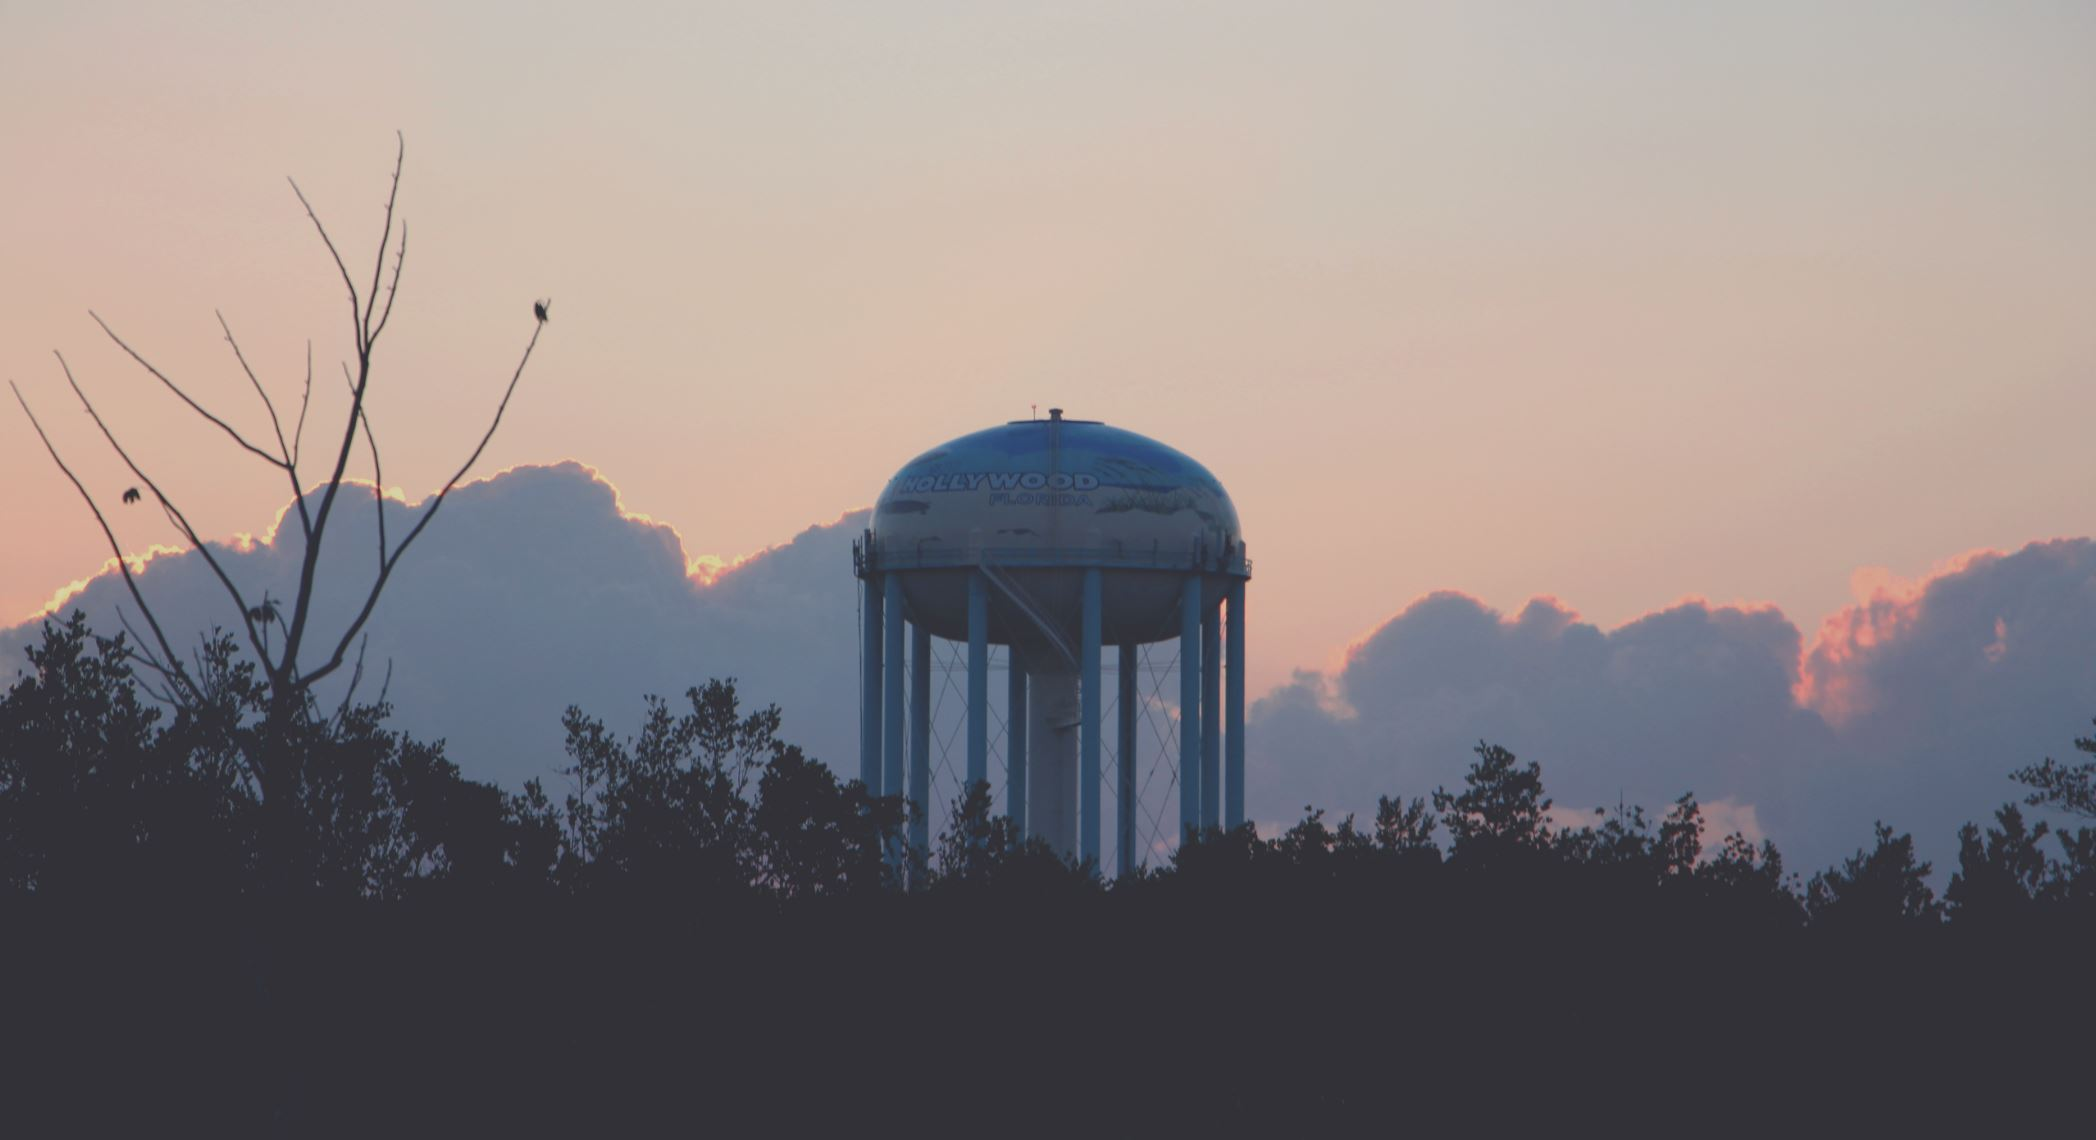 Inland towns need far more water storage - Image Credit:  Marshal Quast via Unsplash